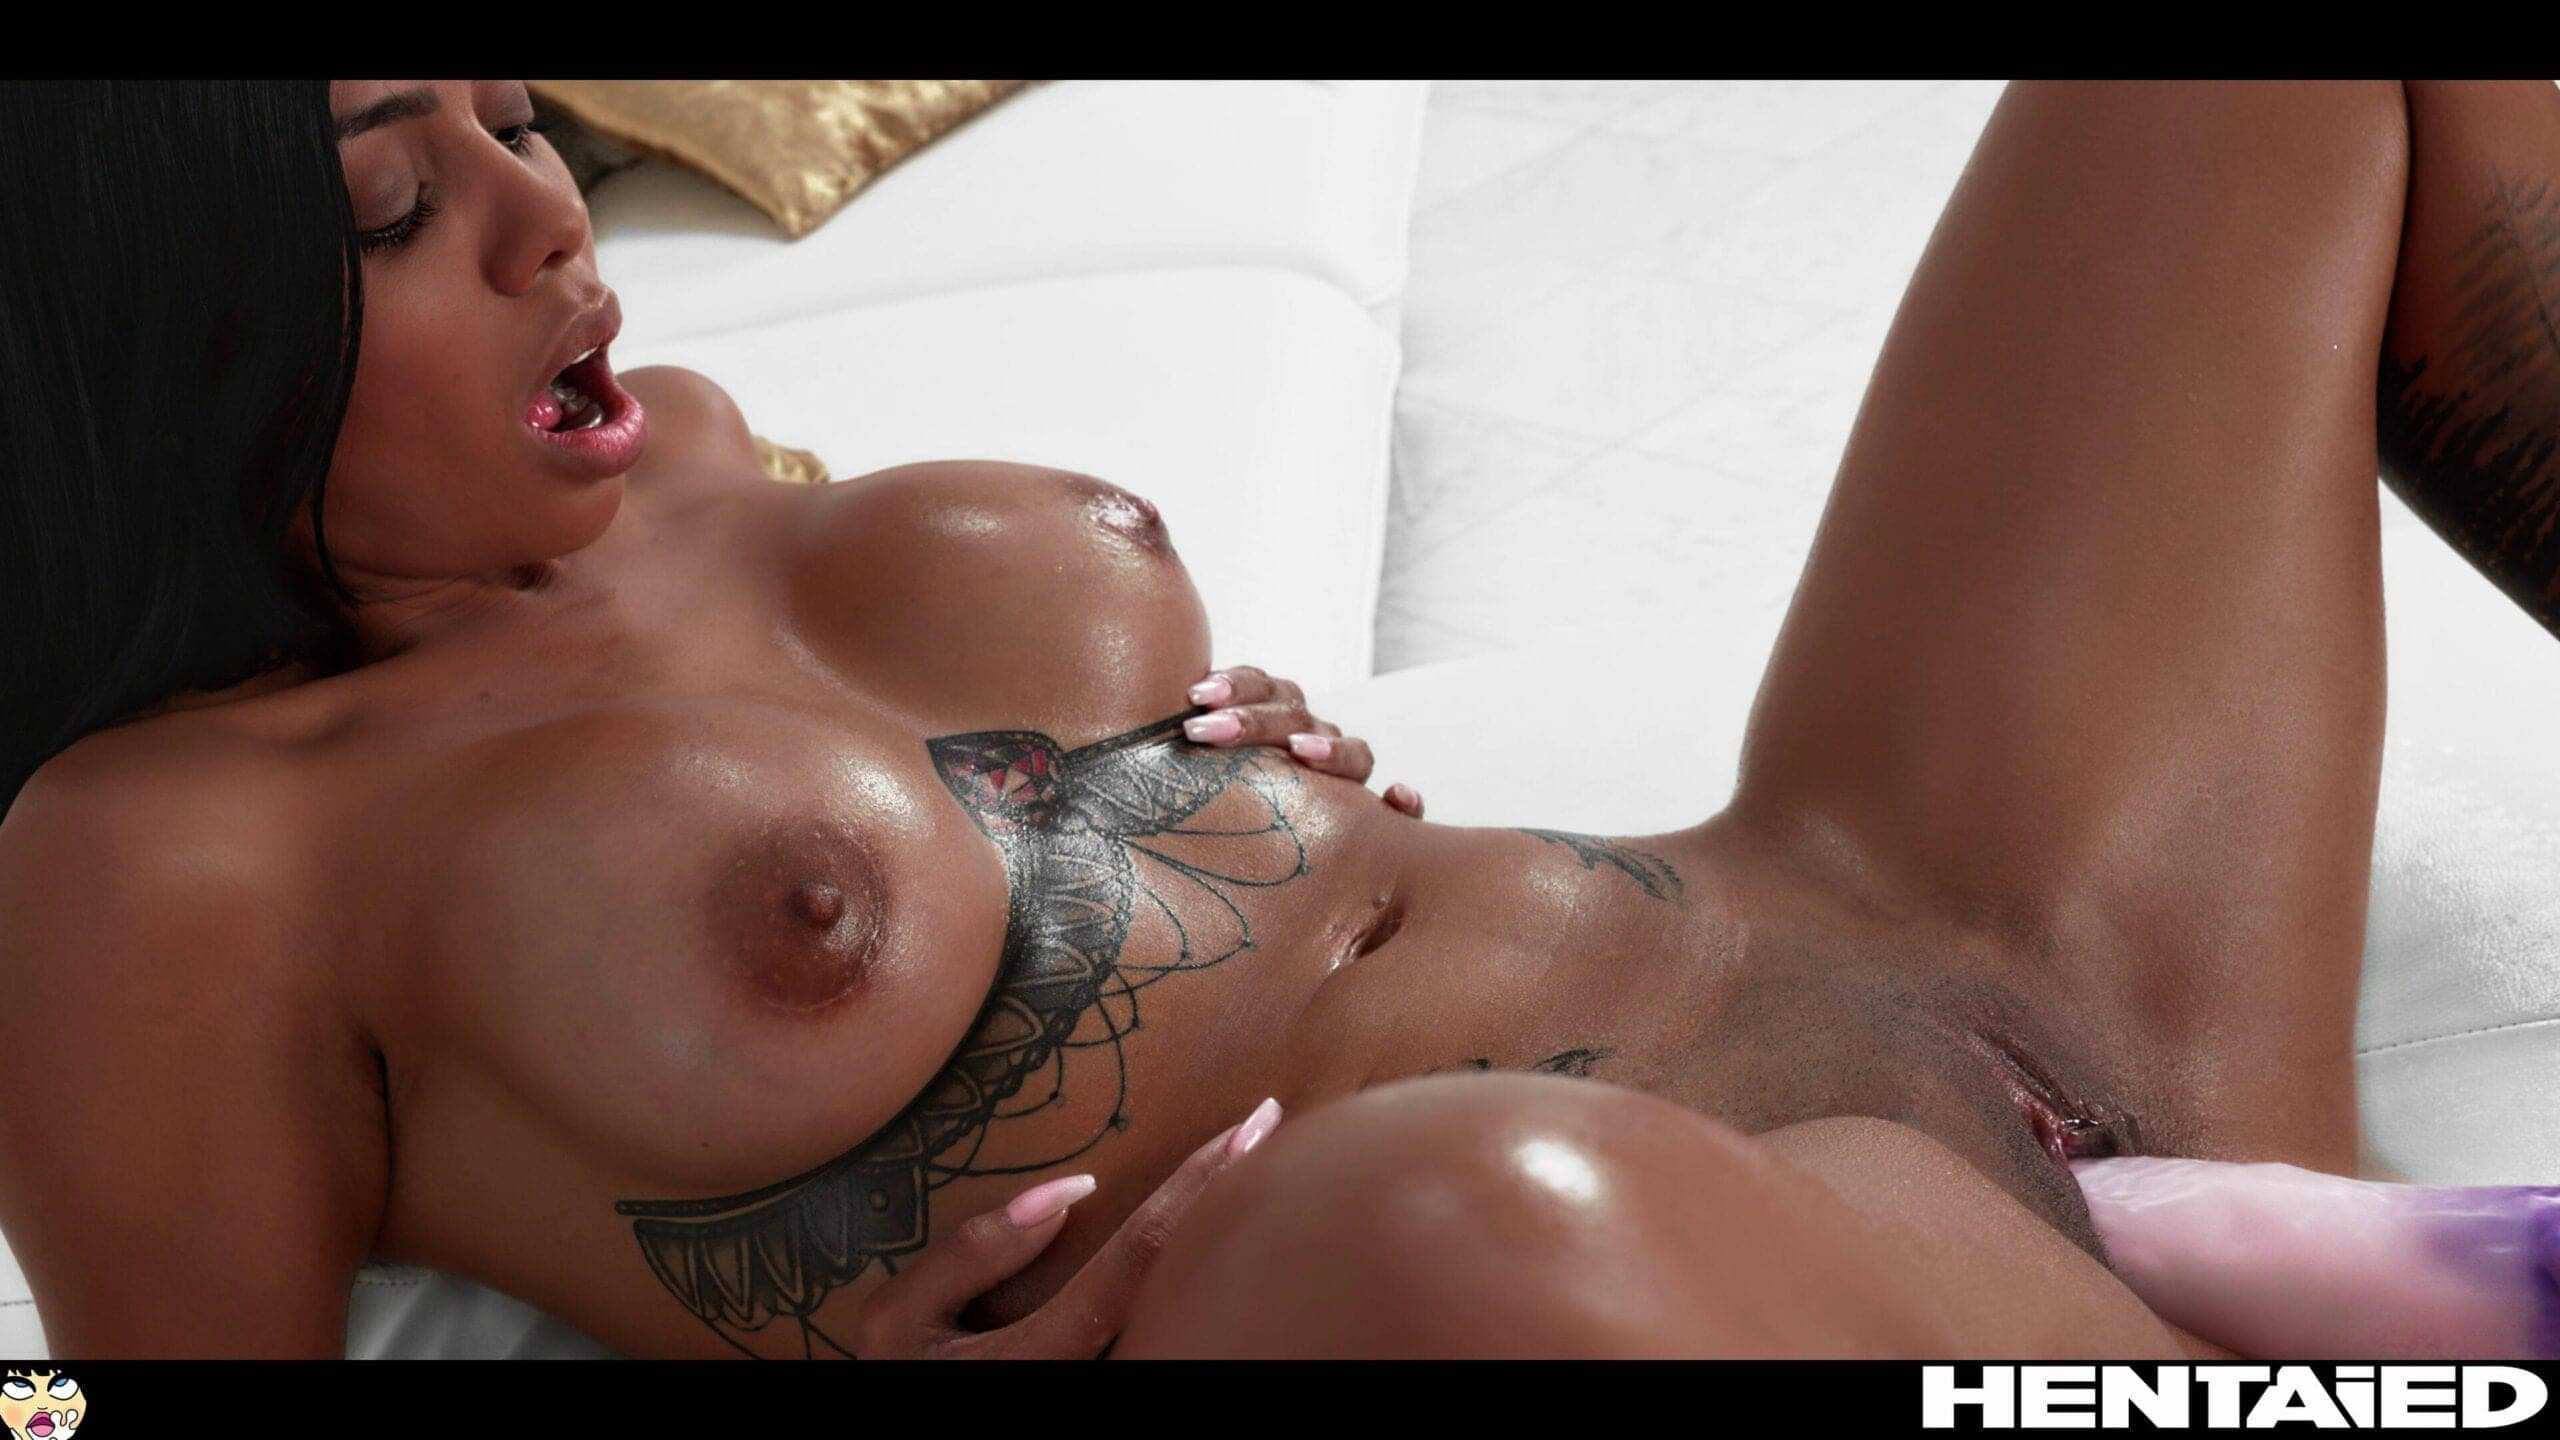 Canela Skin pornstar orgasm on pink dildo